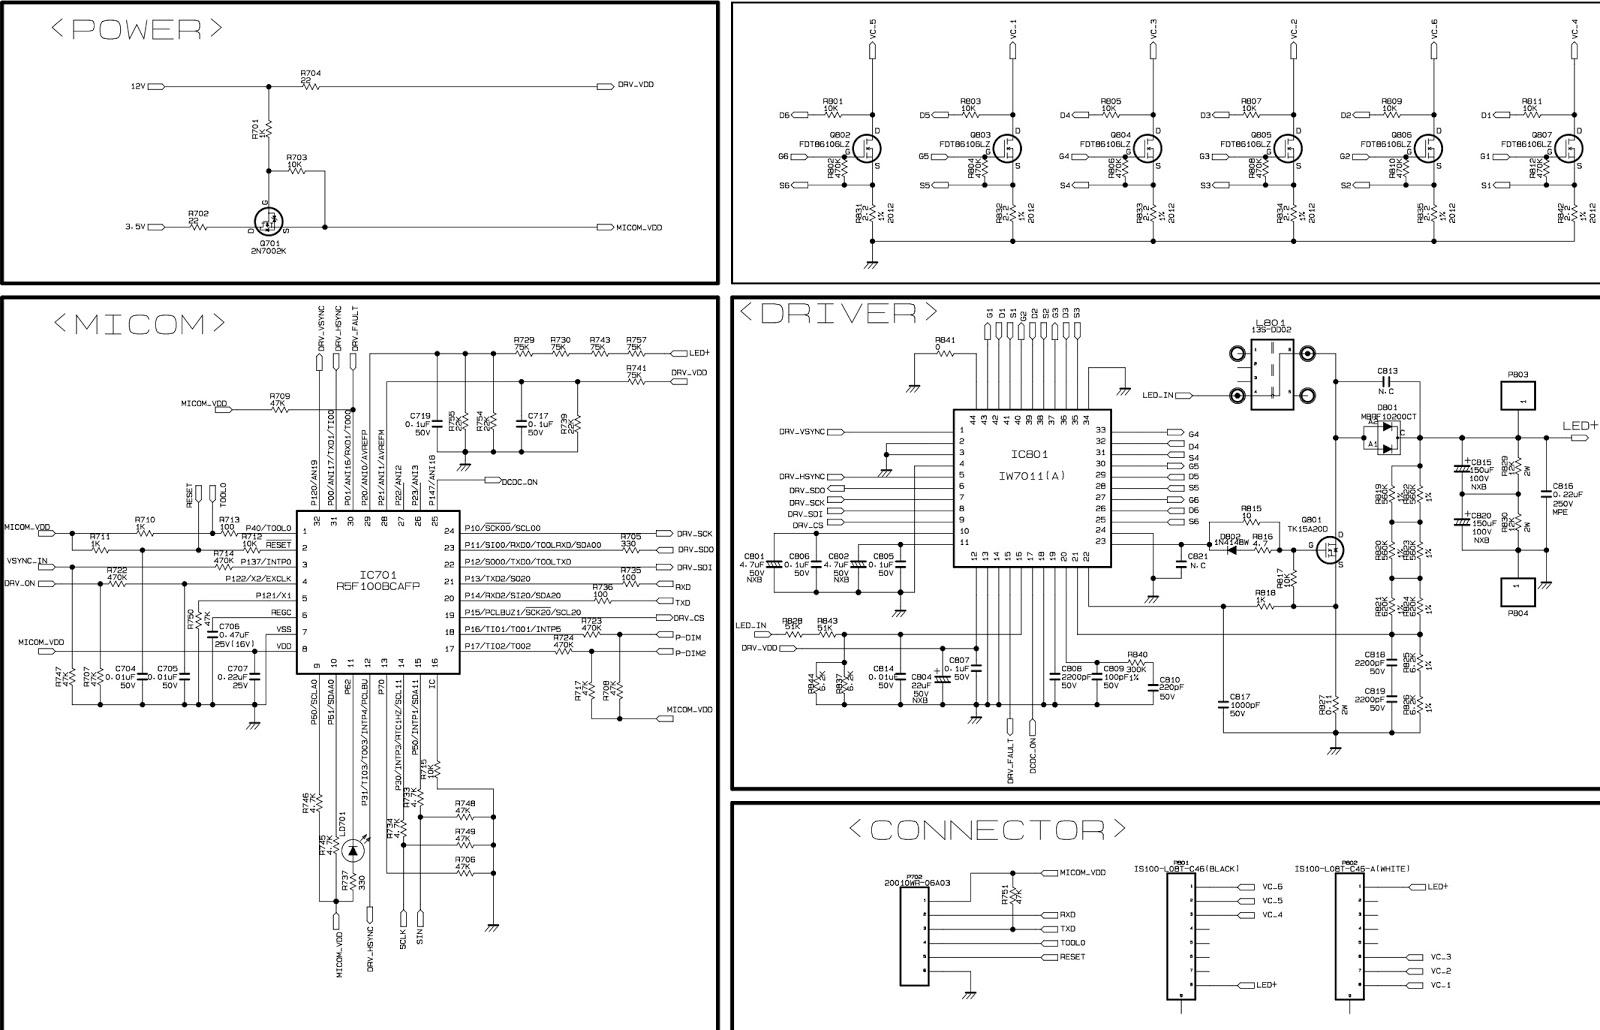 Lg Led Tv Power Supply Circuit Diagram - Somurich com